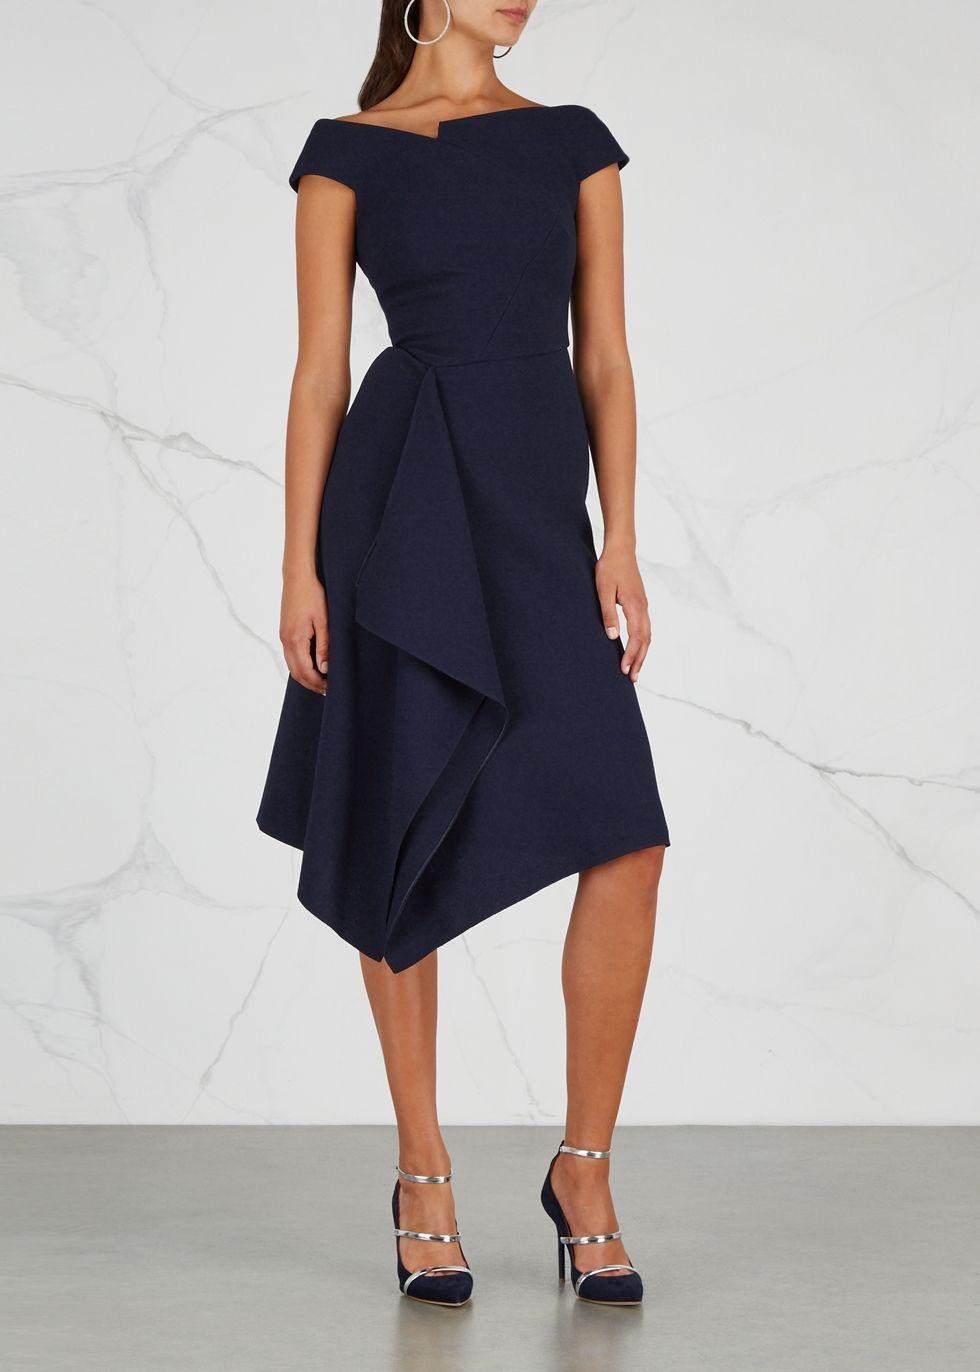 Barwick Navy Draped Wool Dress Roland Mouret Navy Lace Midi Dress Black Lace Midi Dress Stretch Knit Dress [ 1372 x 980 Pixel ]